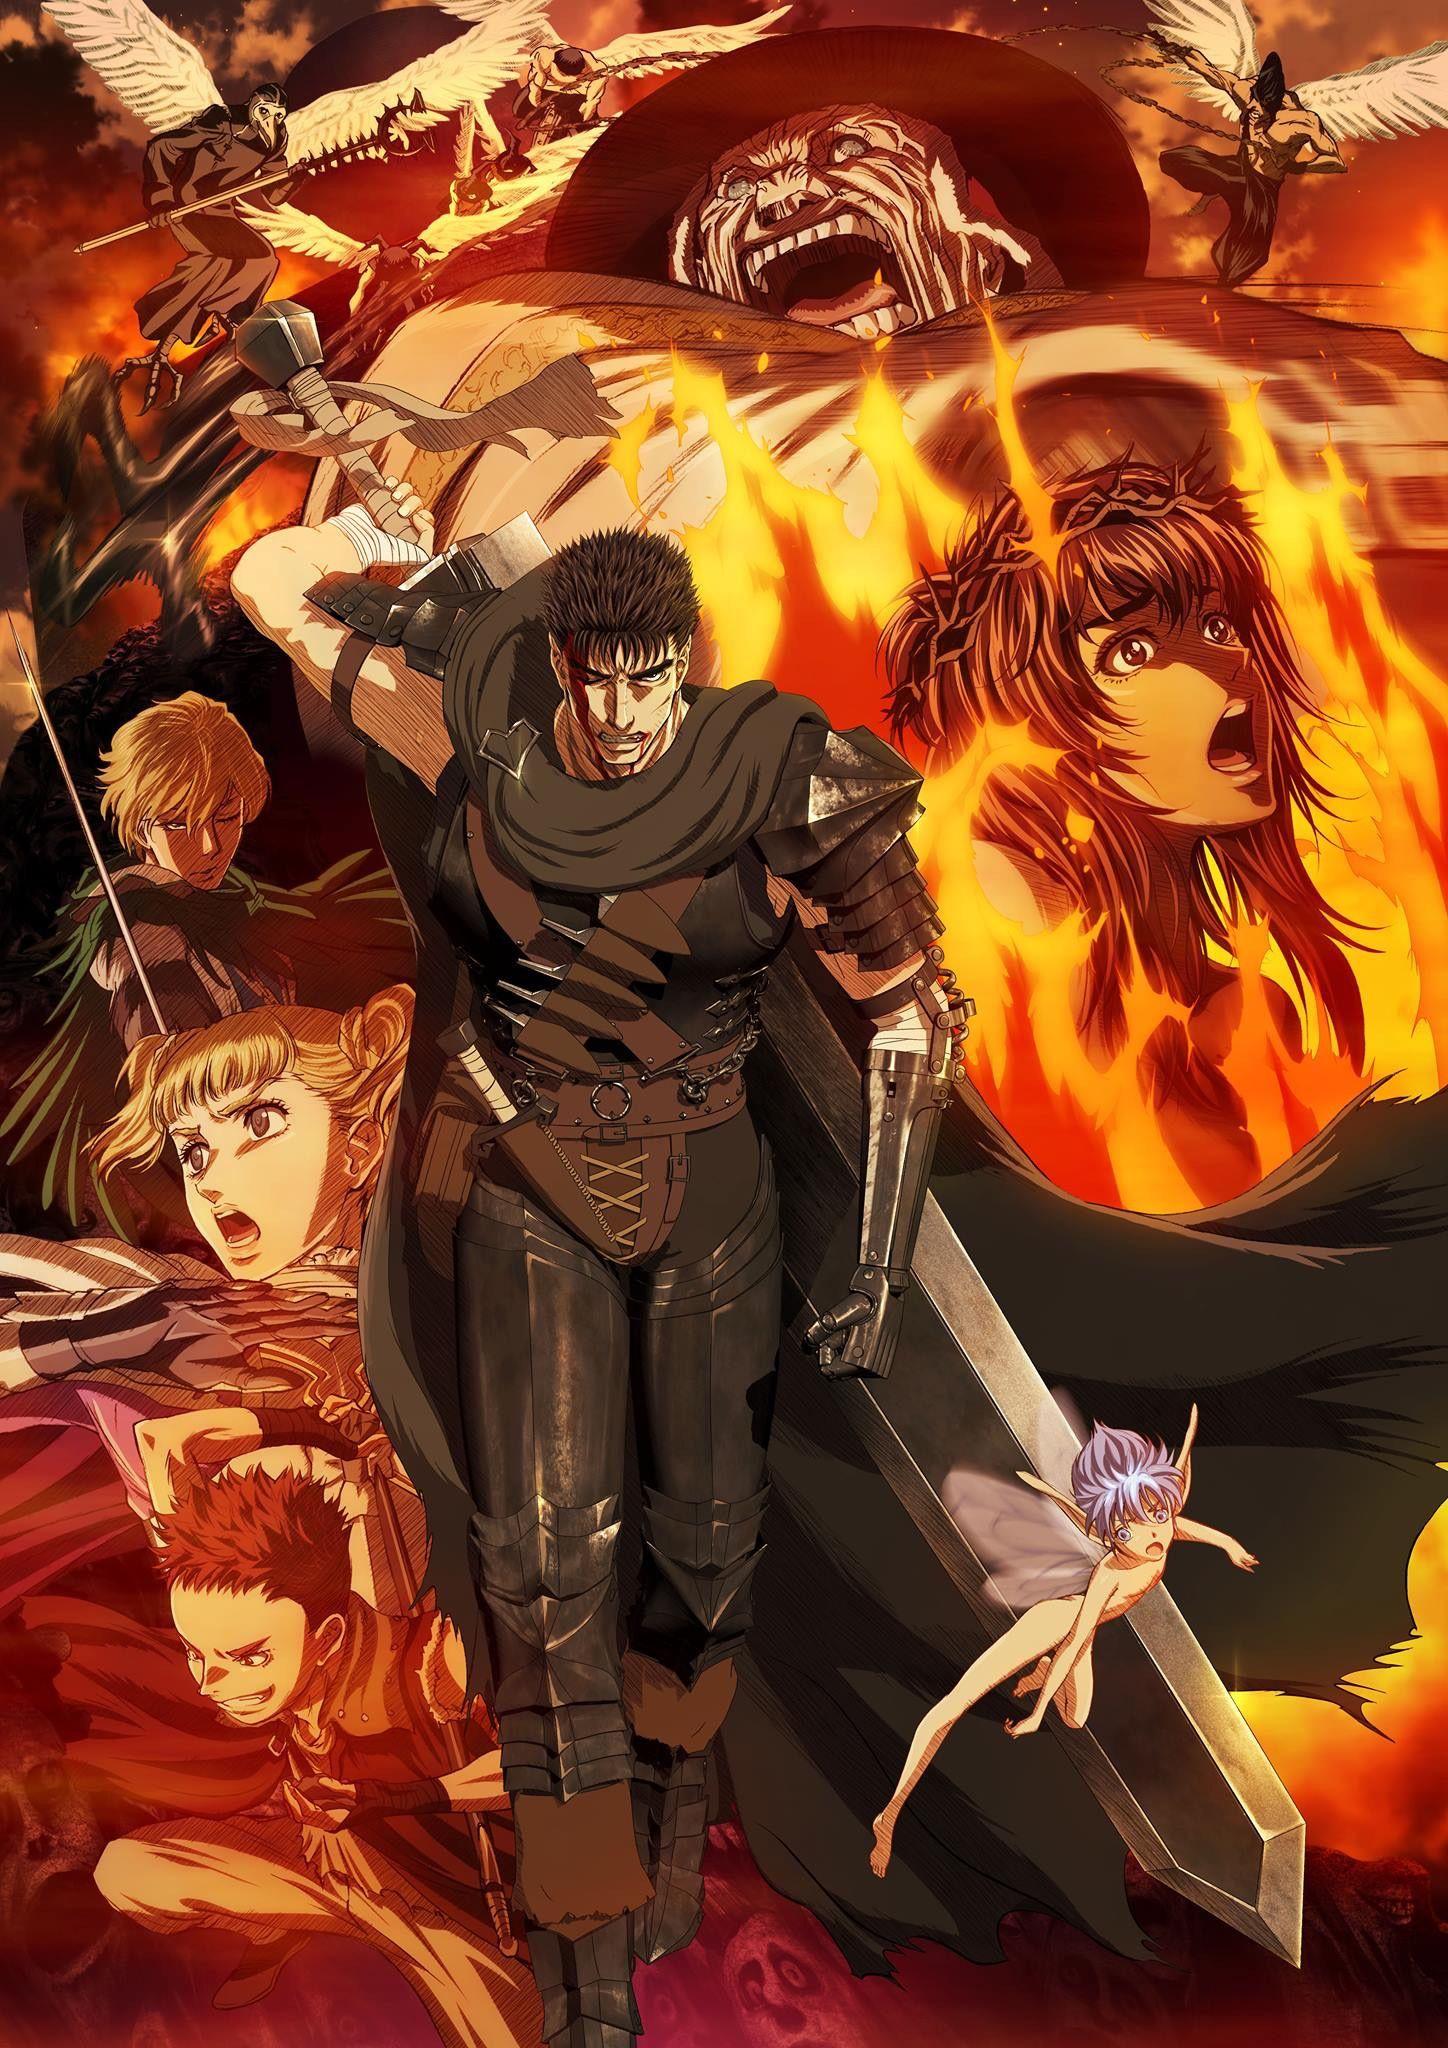 Pin de Daniel Mendez em Anime Anime, Berserk, Poster